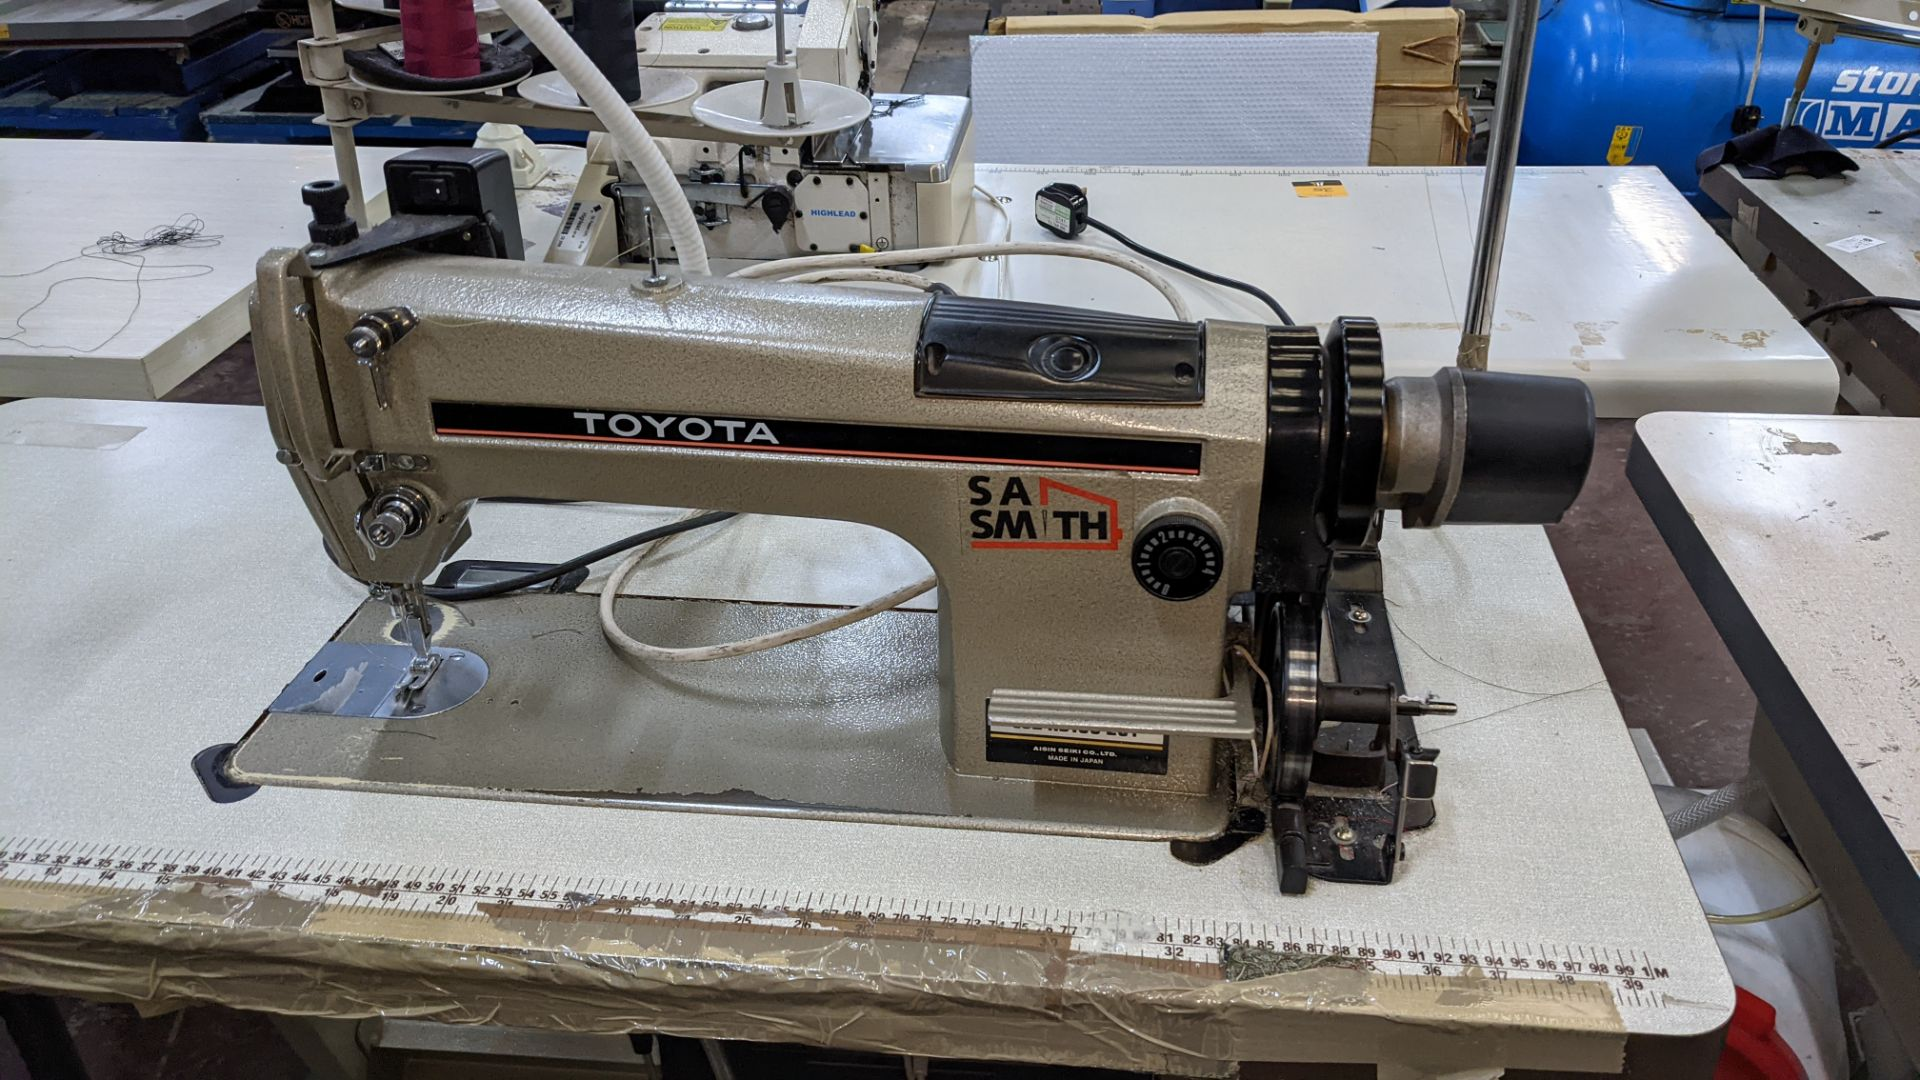 Toyota sewing machine - Image 5 of 17